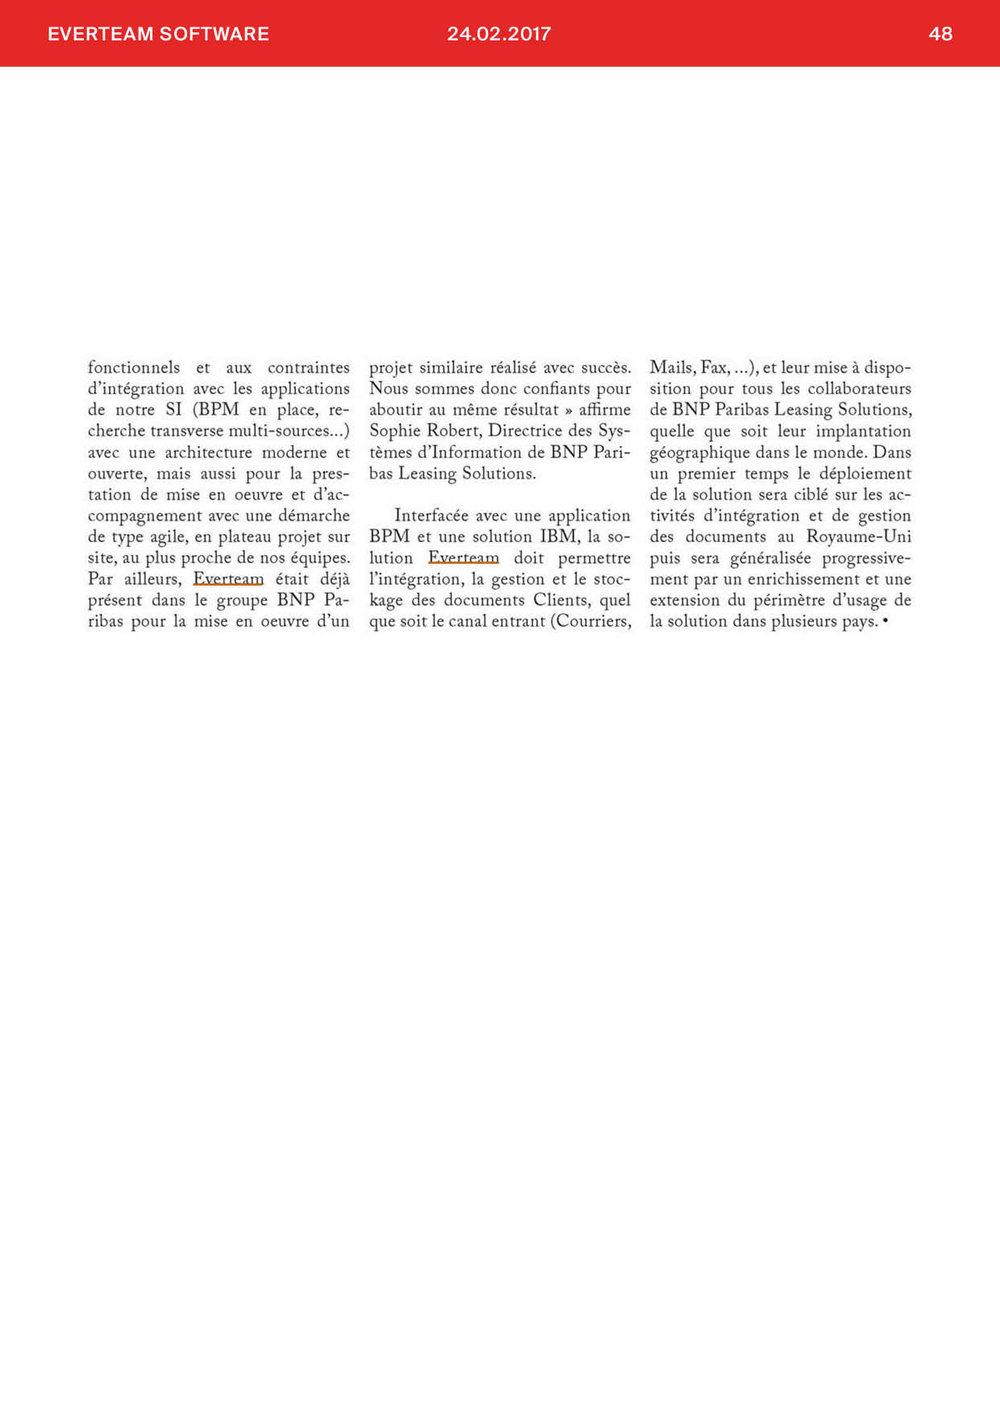 BOOKMEDIA_FEV48.jpg